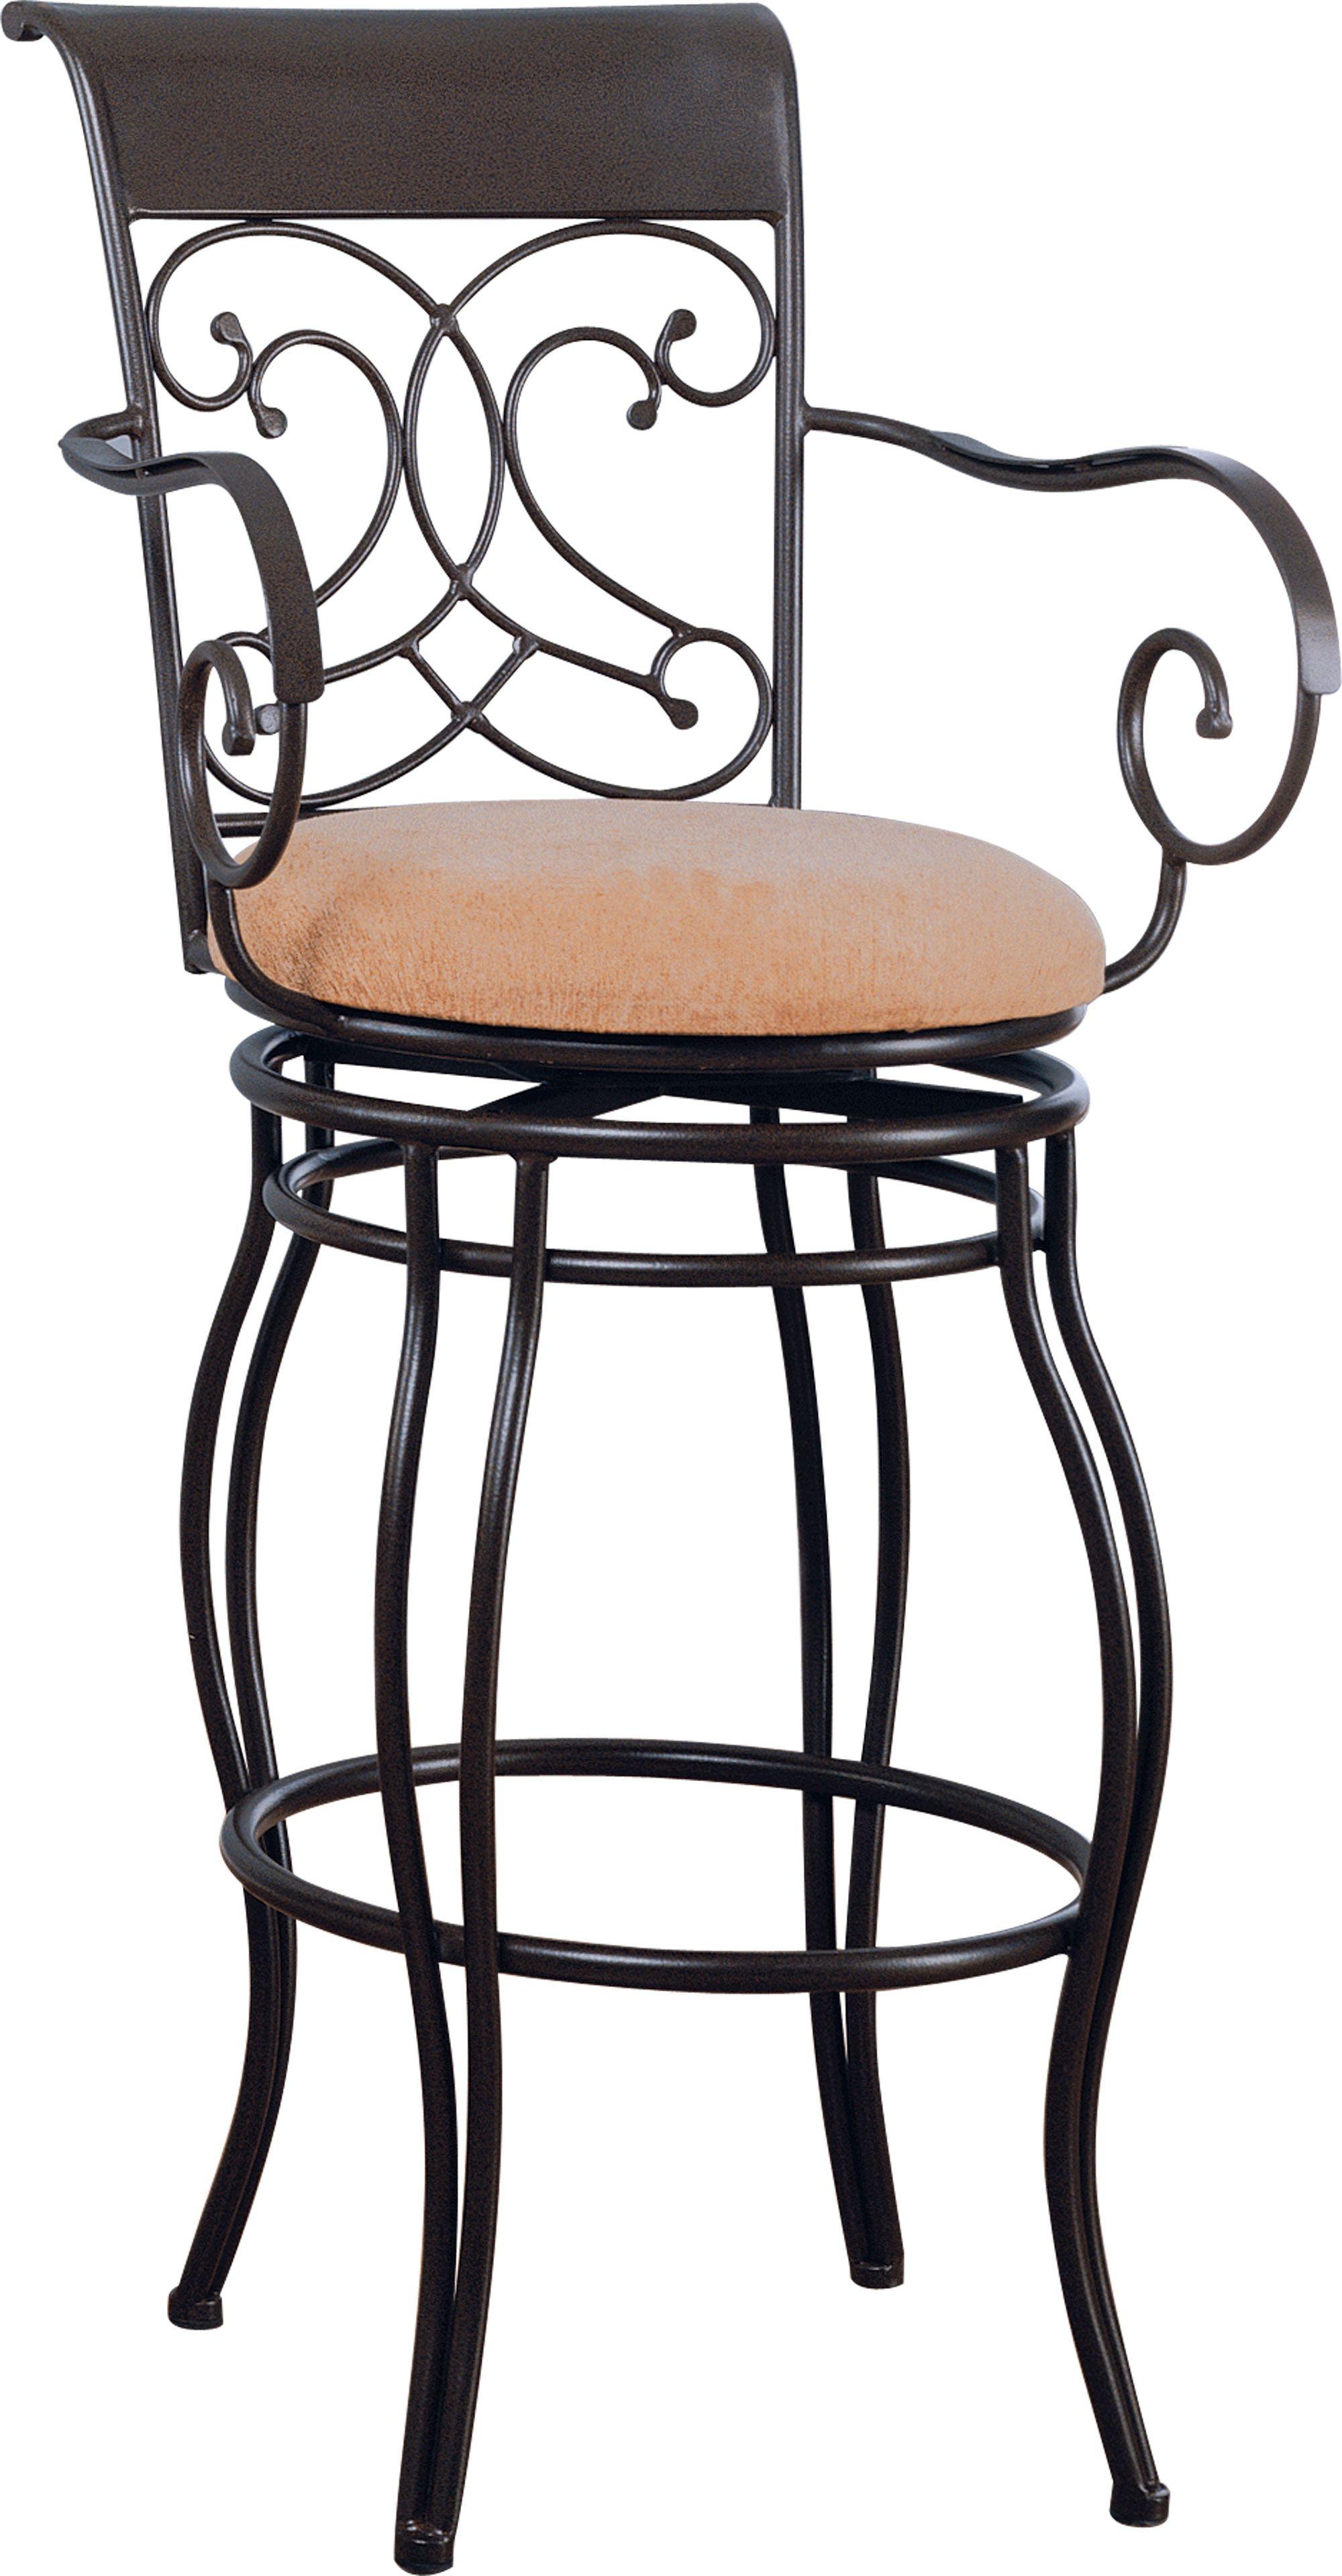 Coaster Dark Brown 29 Metal Bar Stool With Upholstered Seat